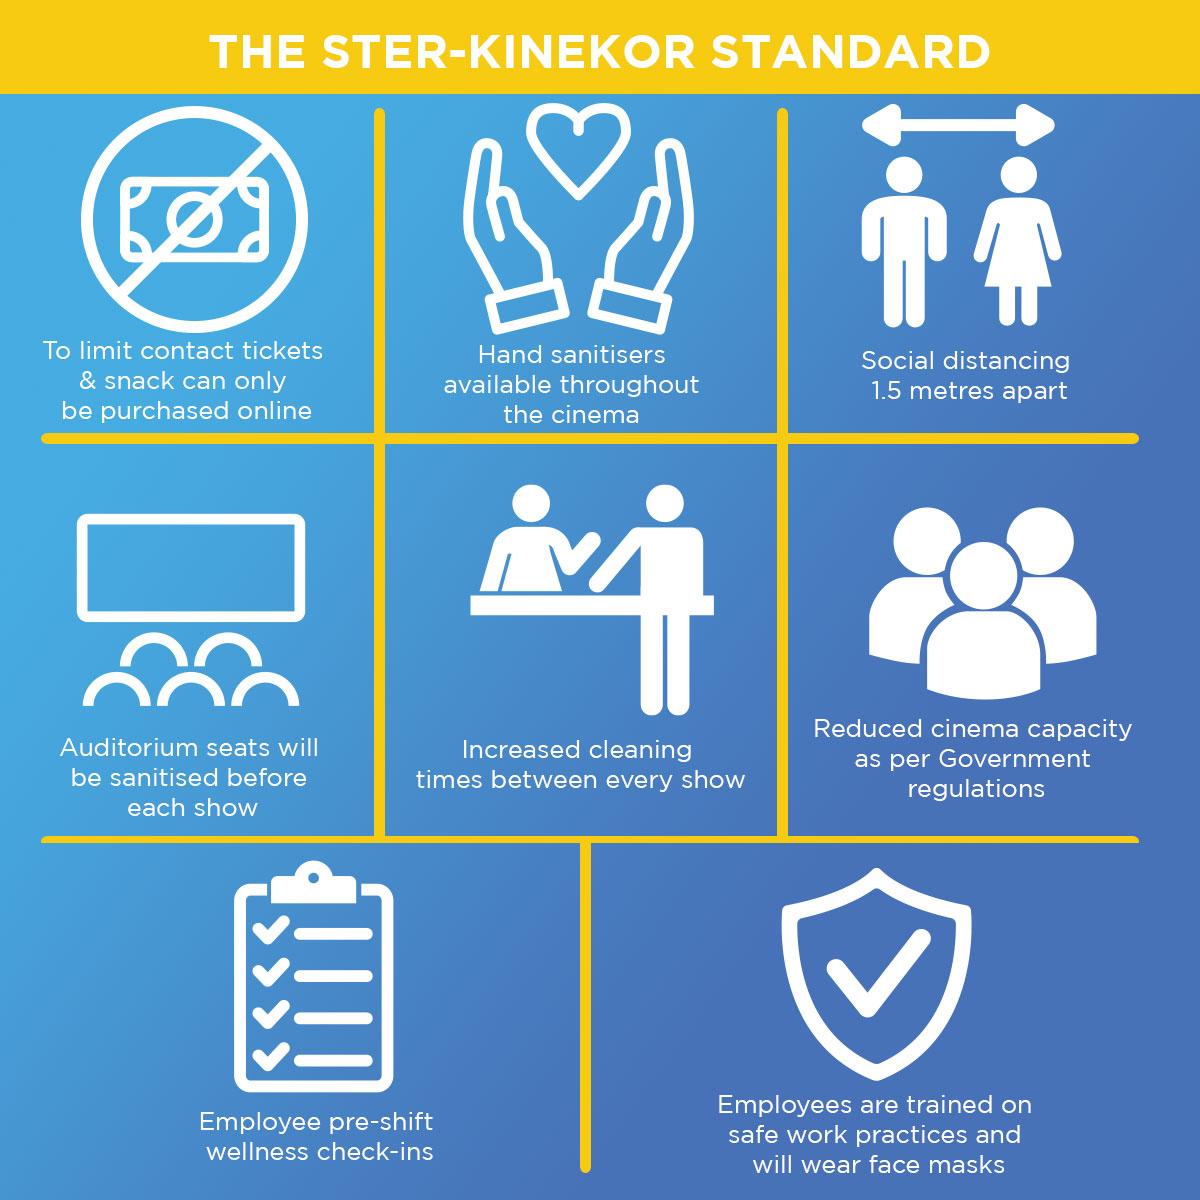 Ster-Kinekor Standard Covid Regulations